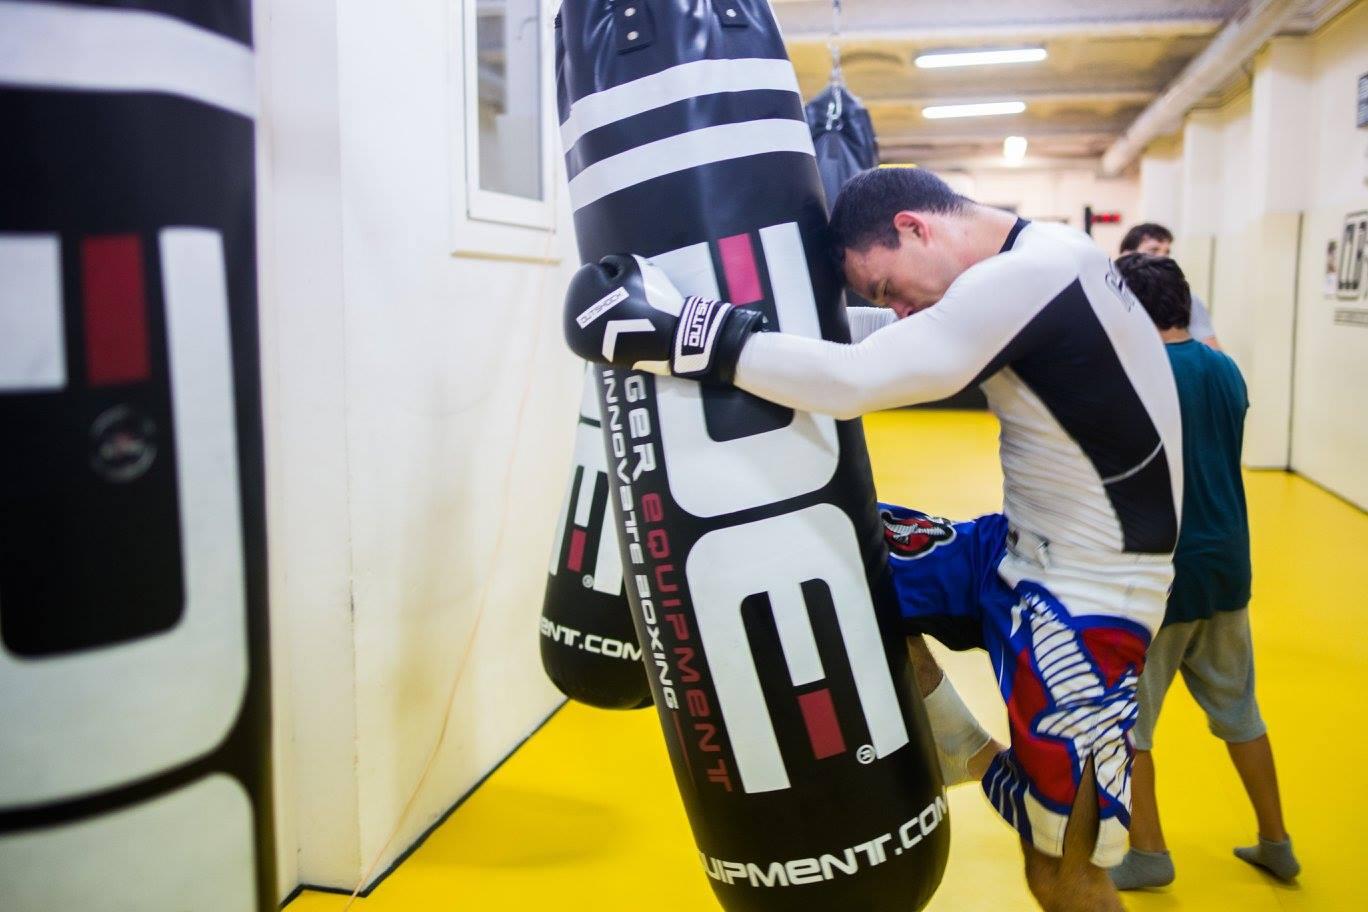 mand doing kickboxing in el club de la lucha barcelona